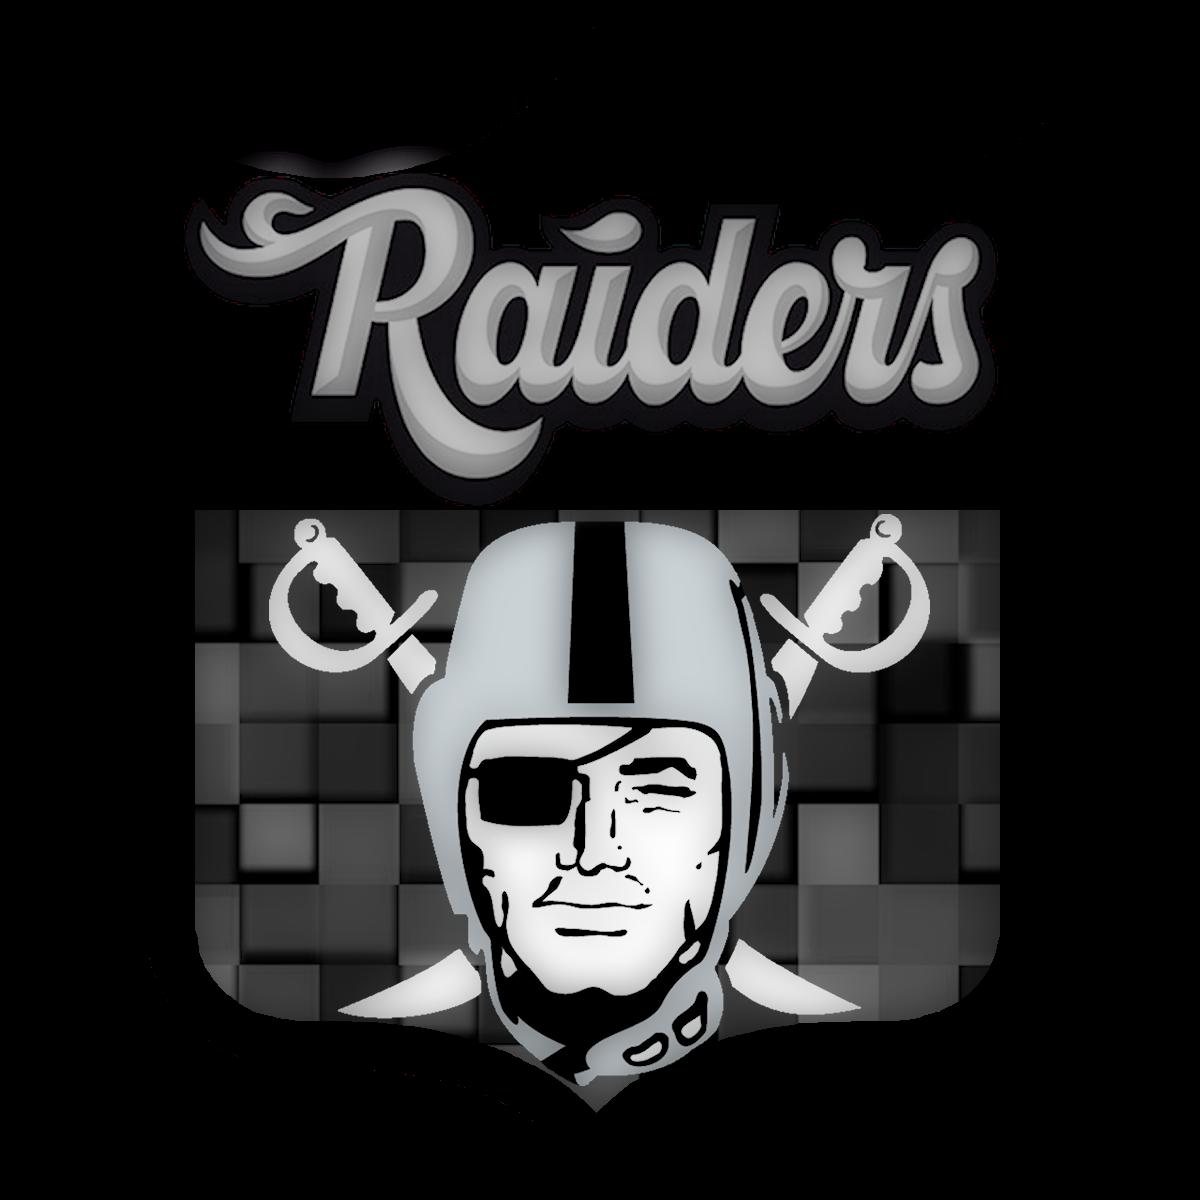 Oakland Raiders Logo Oakland raiders logo, Raiders